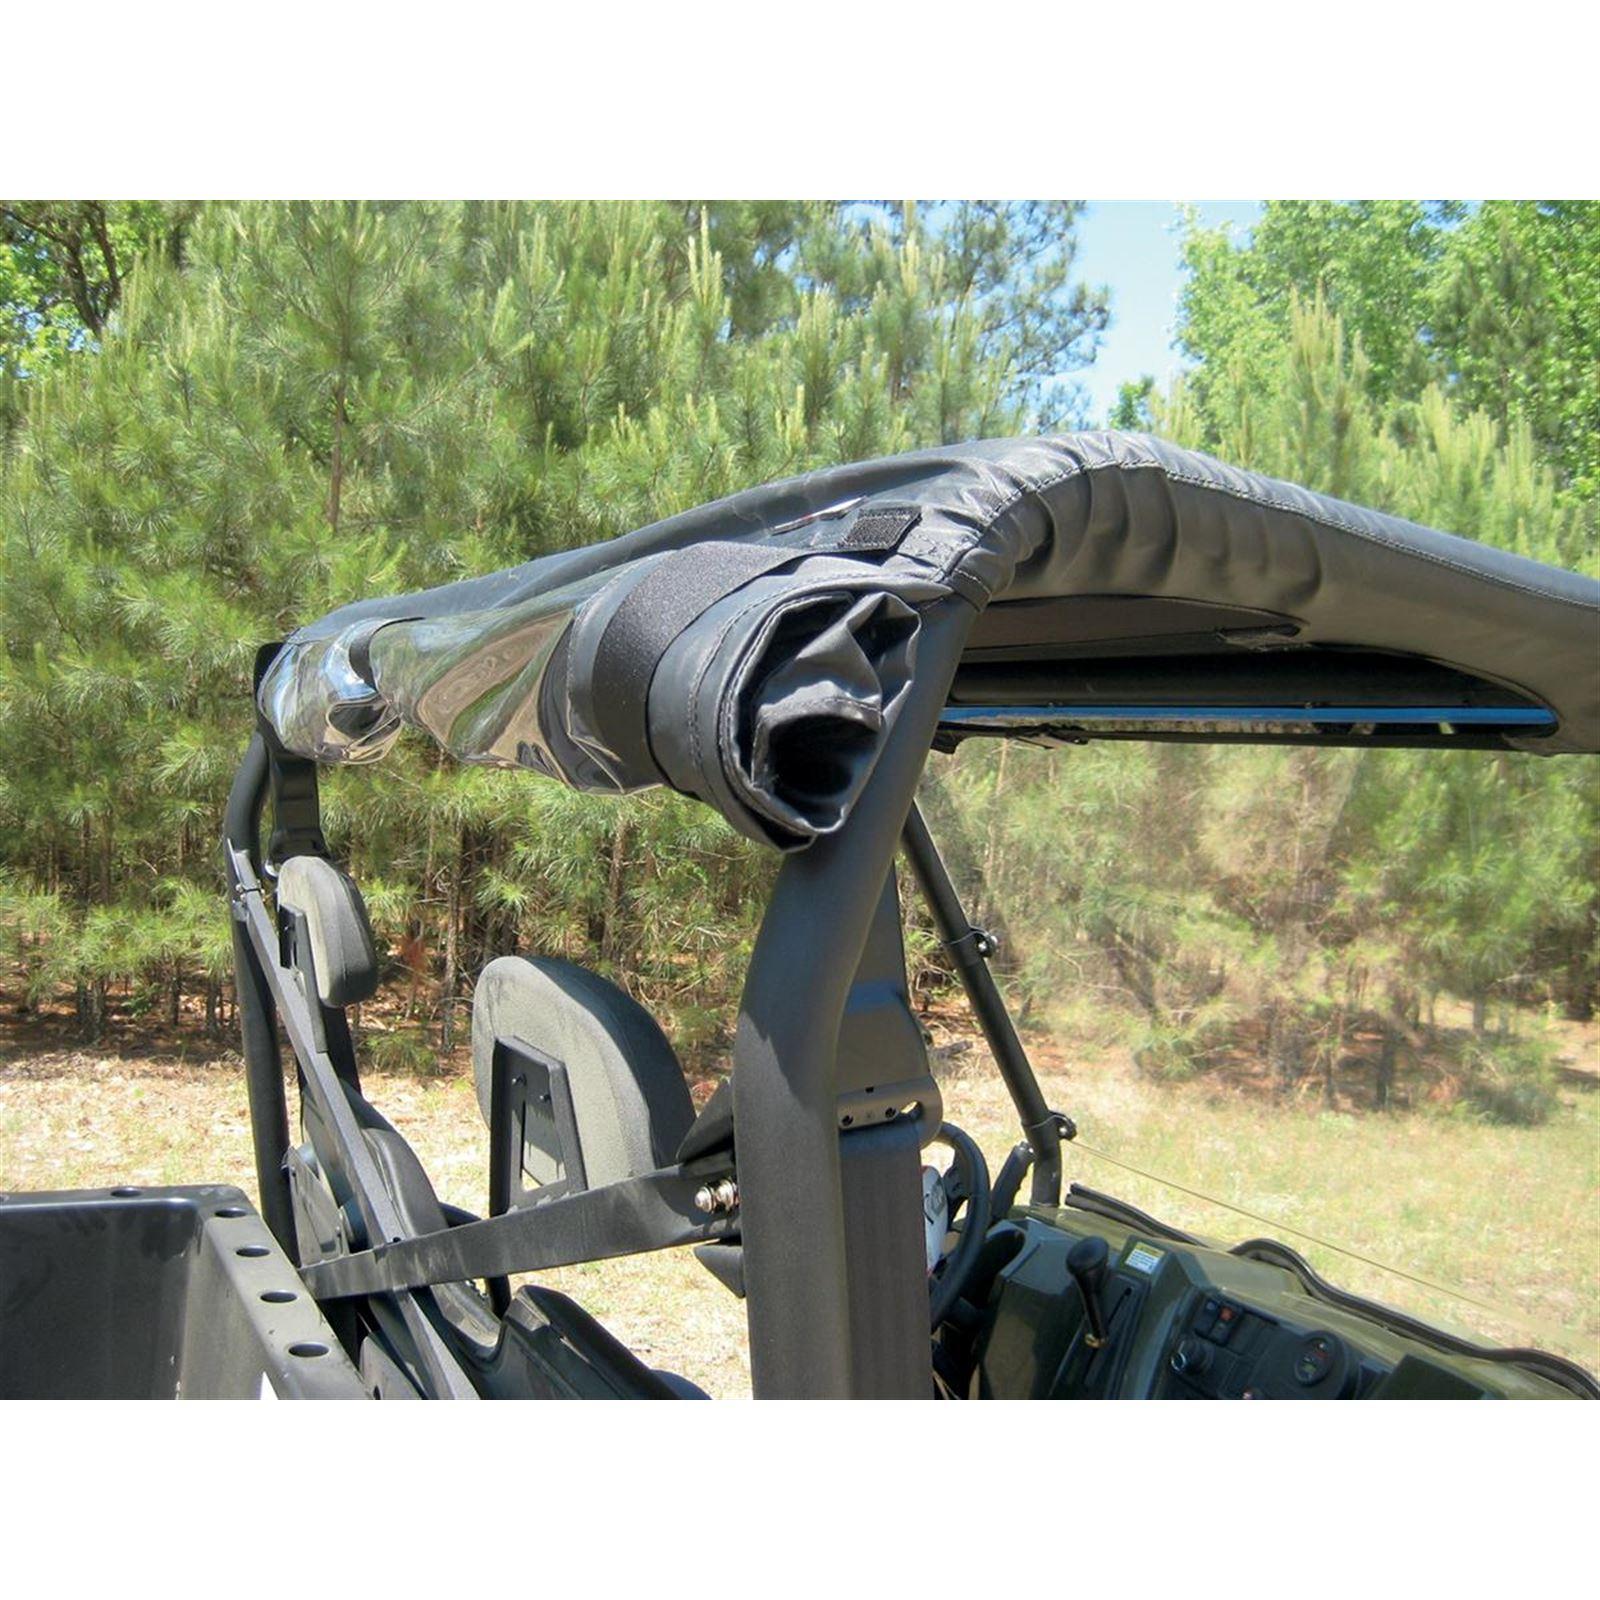 Moose Soft Top Rear Panel - Ranger